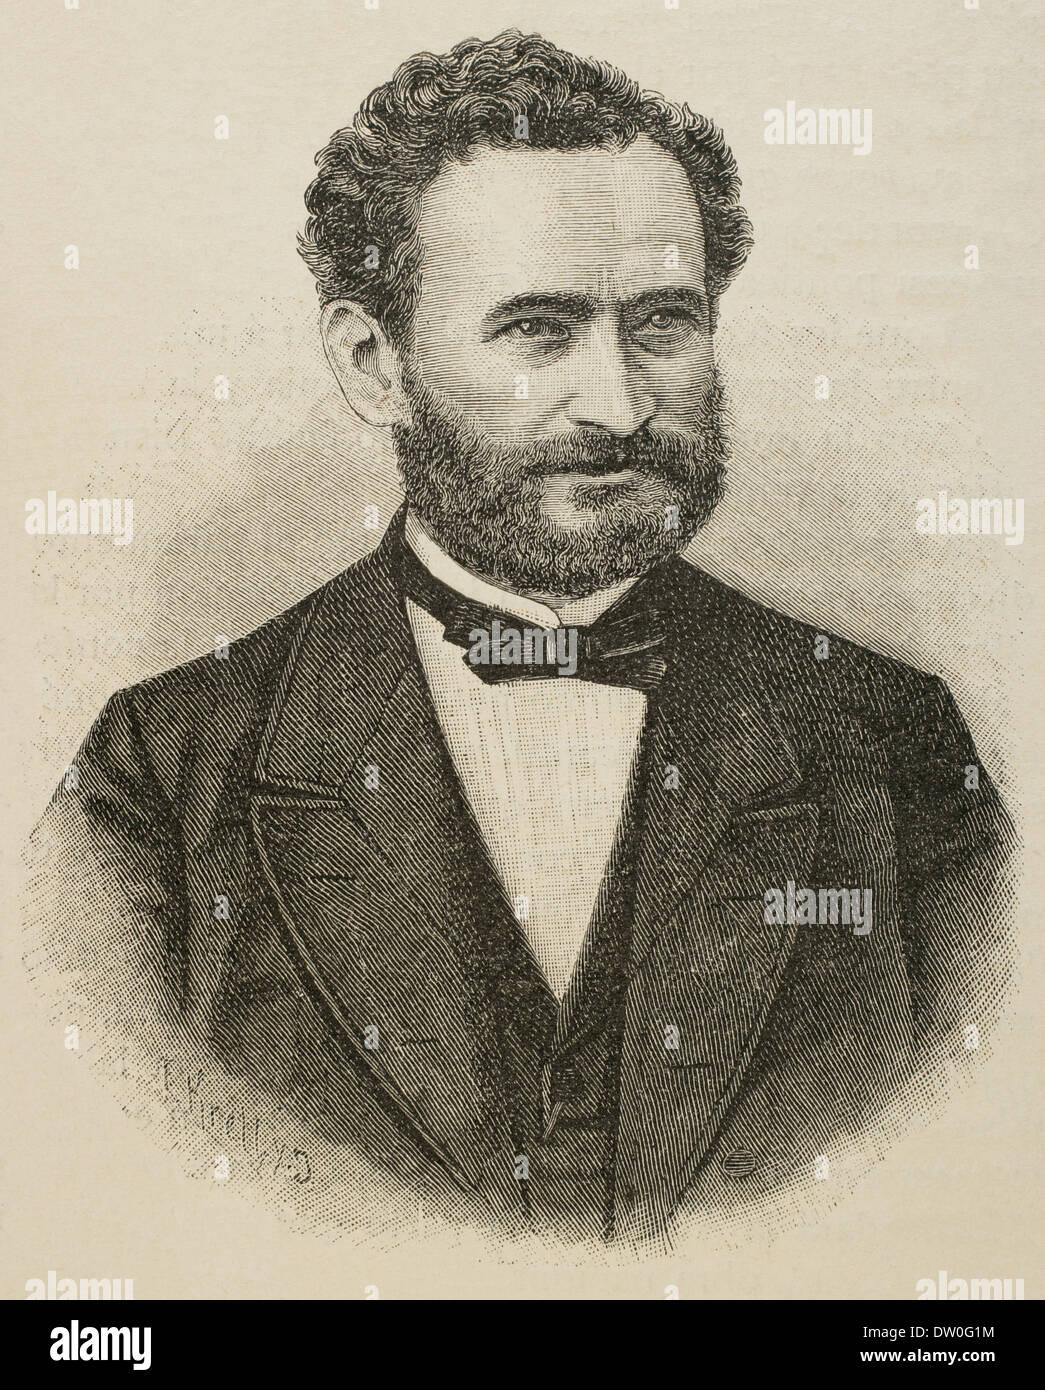 Eduard Lasker (1829-1884). German politician and jurist. Portrait. Engraving. - Stock Image